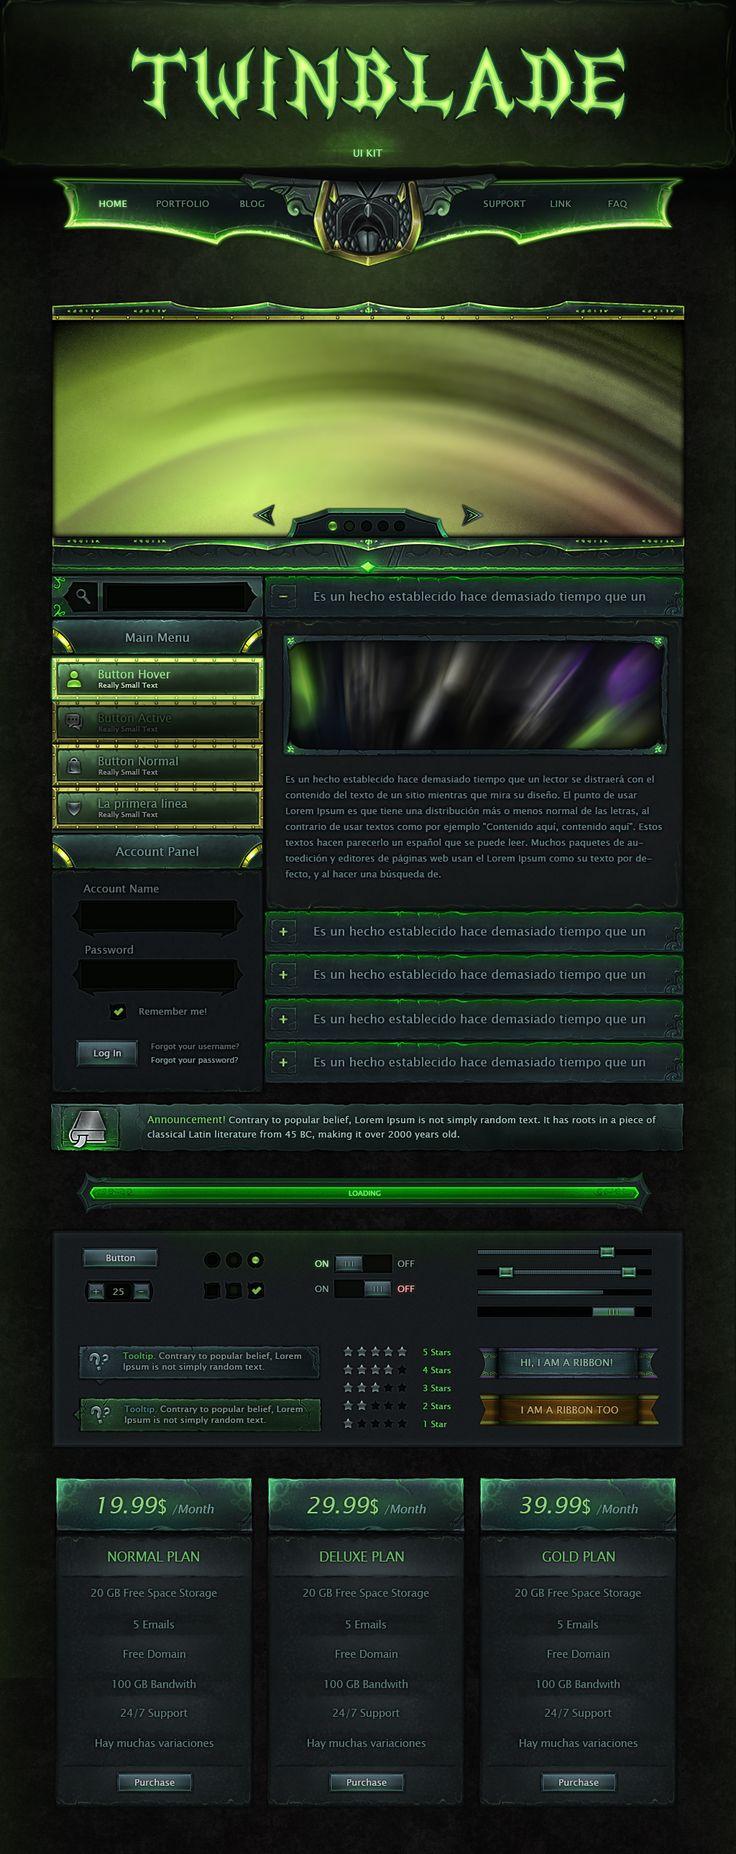 Twinblade UI 2.0 by VengeanceMK1.deviantart.com on @DeviantArt